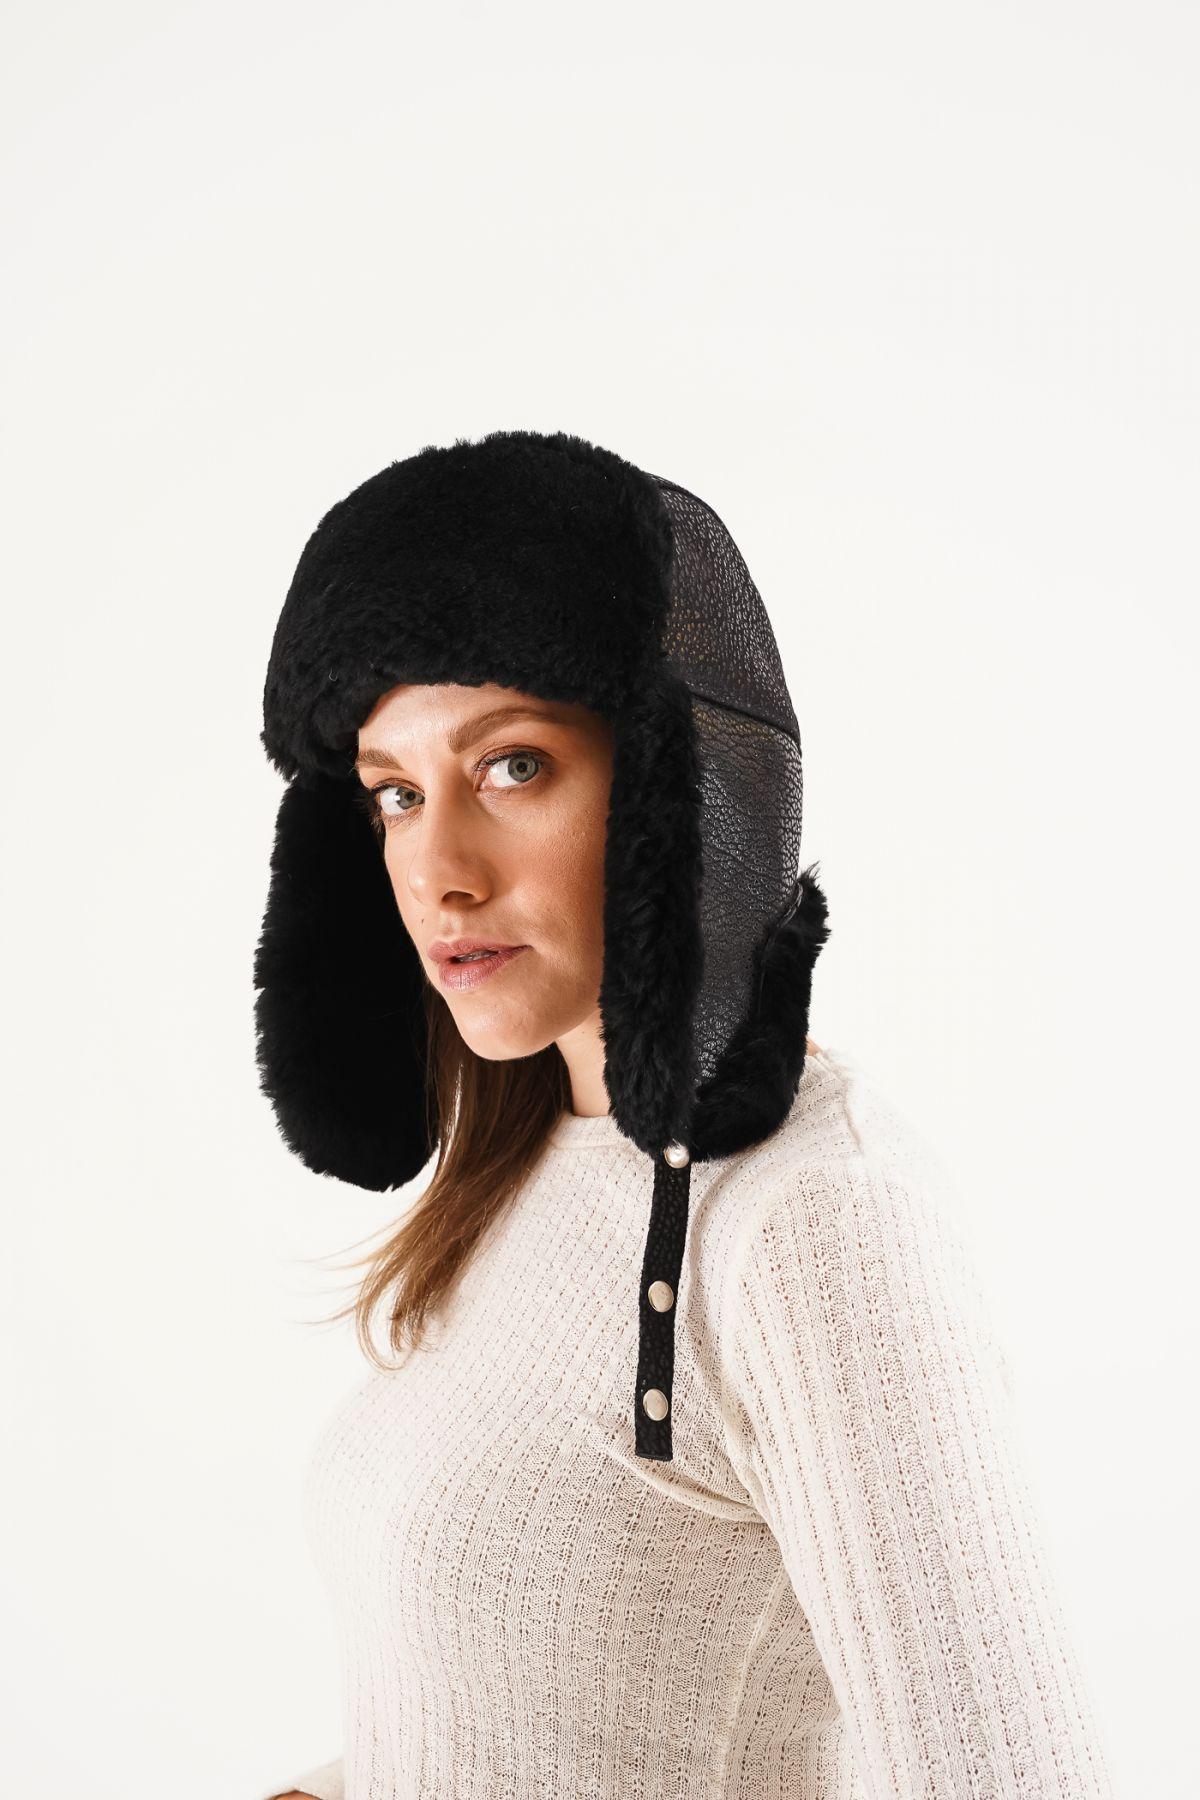 Pegia Hakiki Kürklü Şapka 20SB03 Siyah